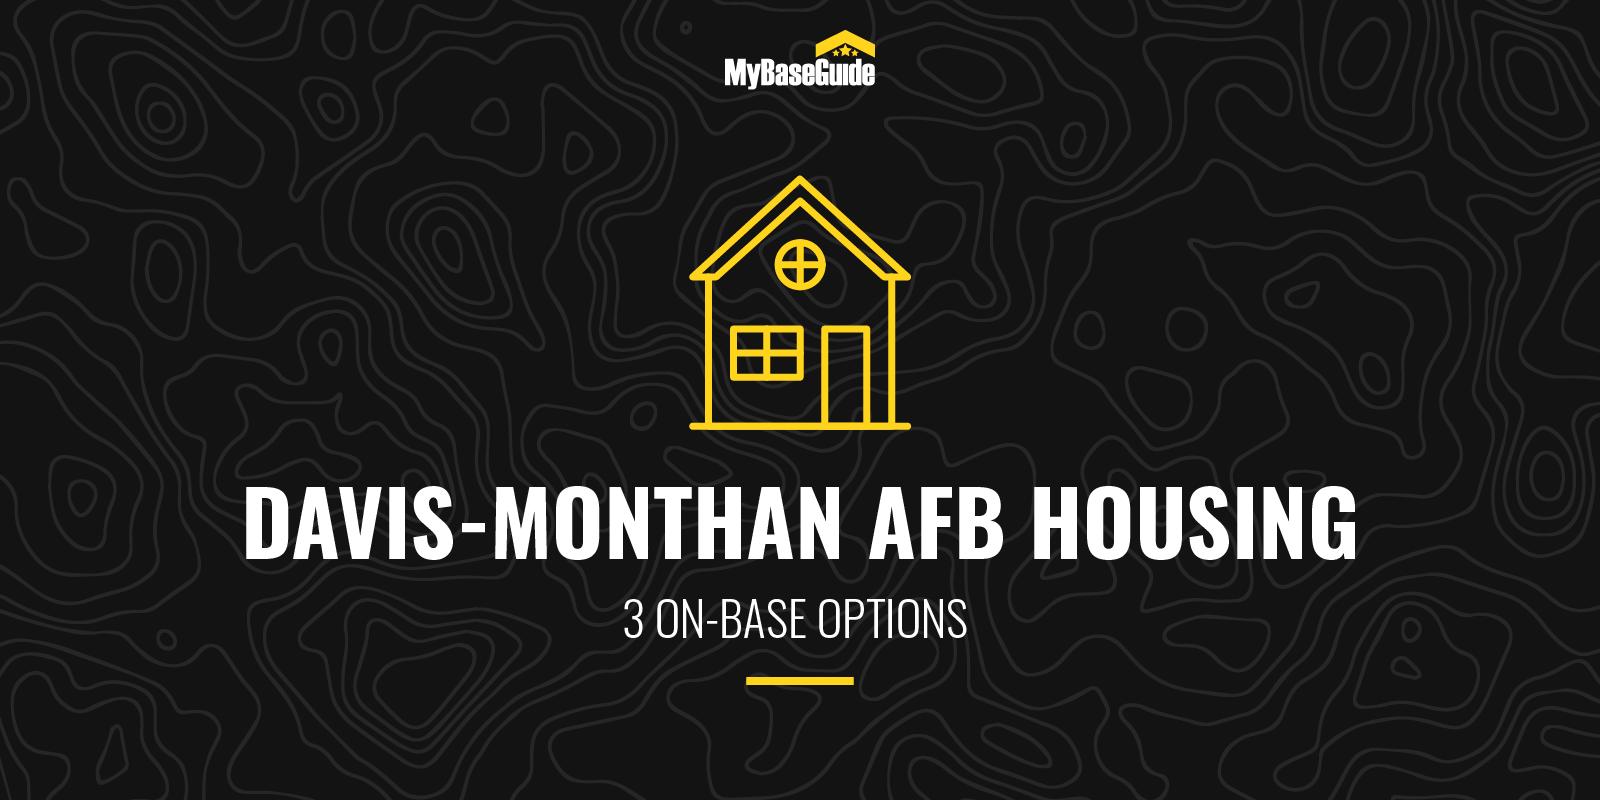 Davis-Monthan AFB Housing: 3 On Base Options